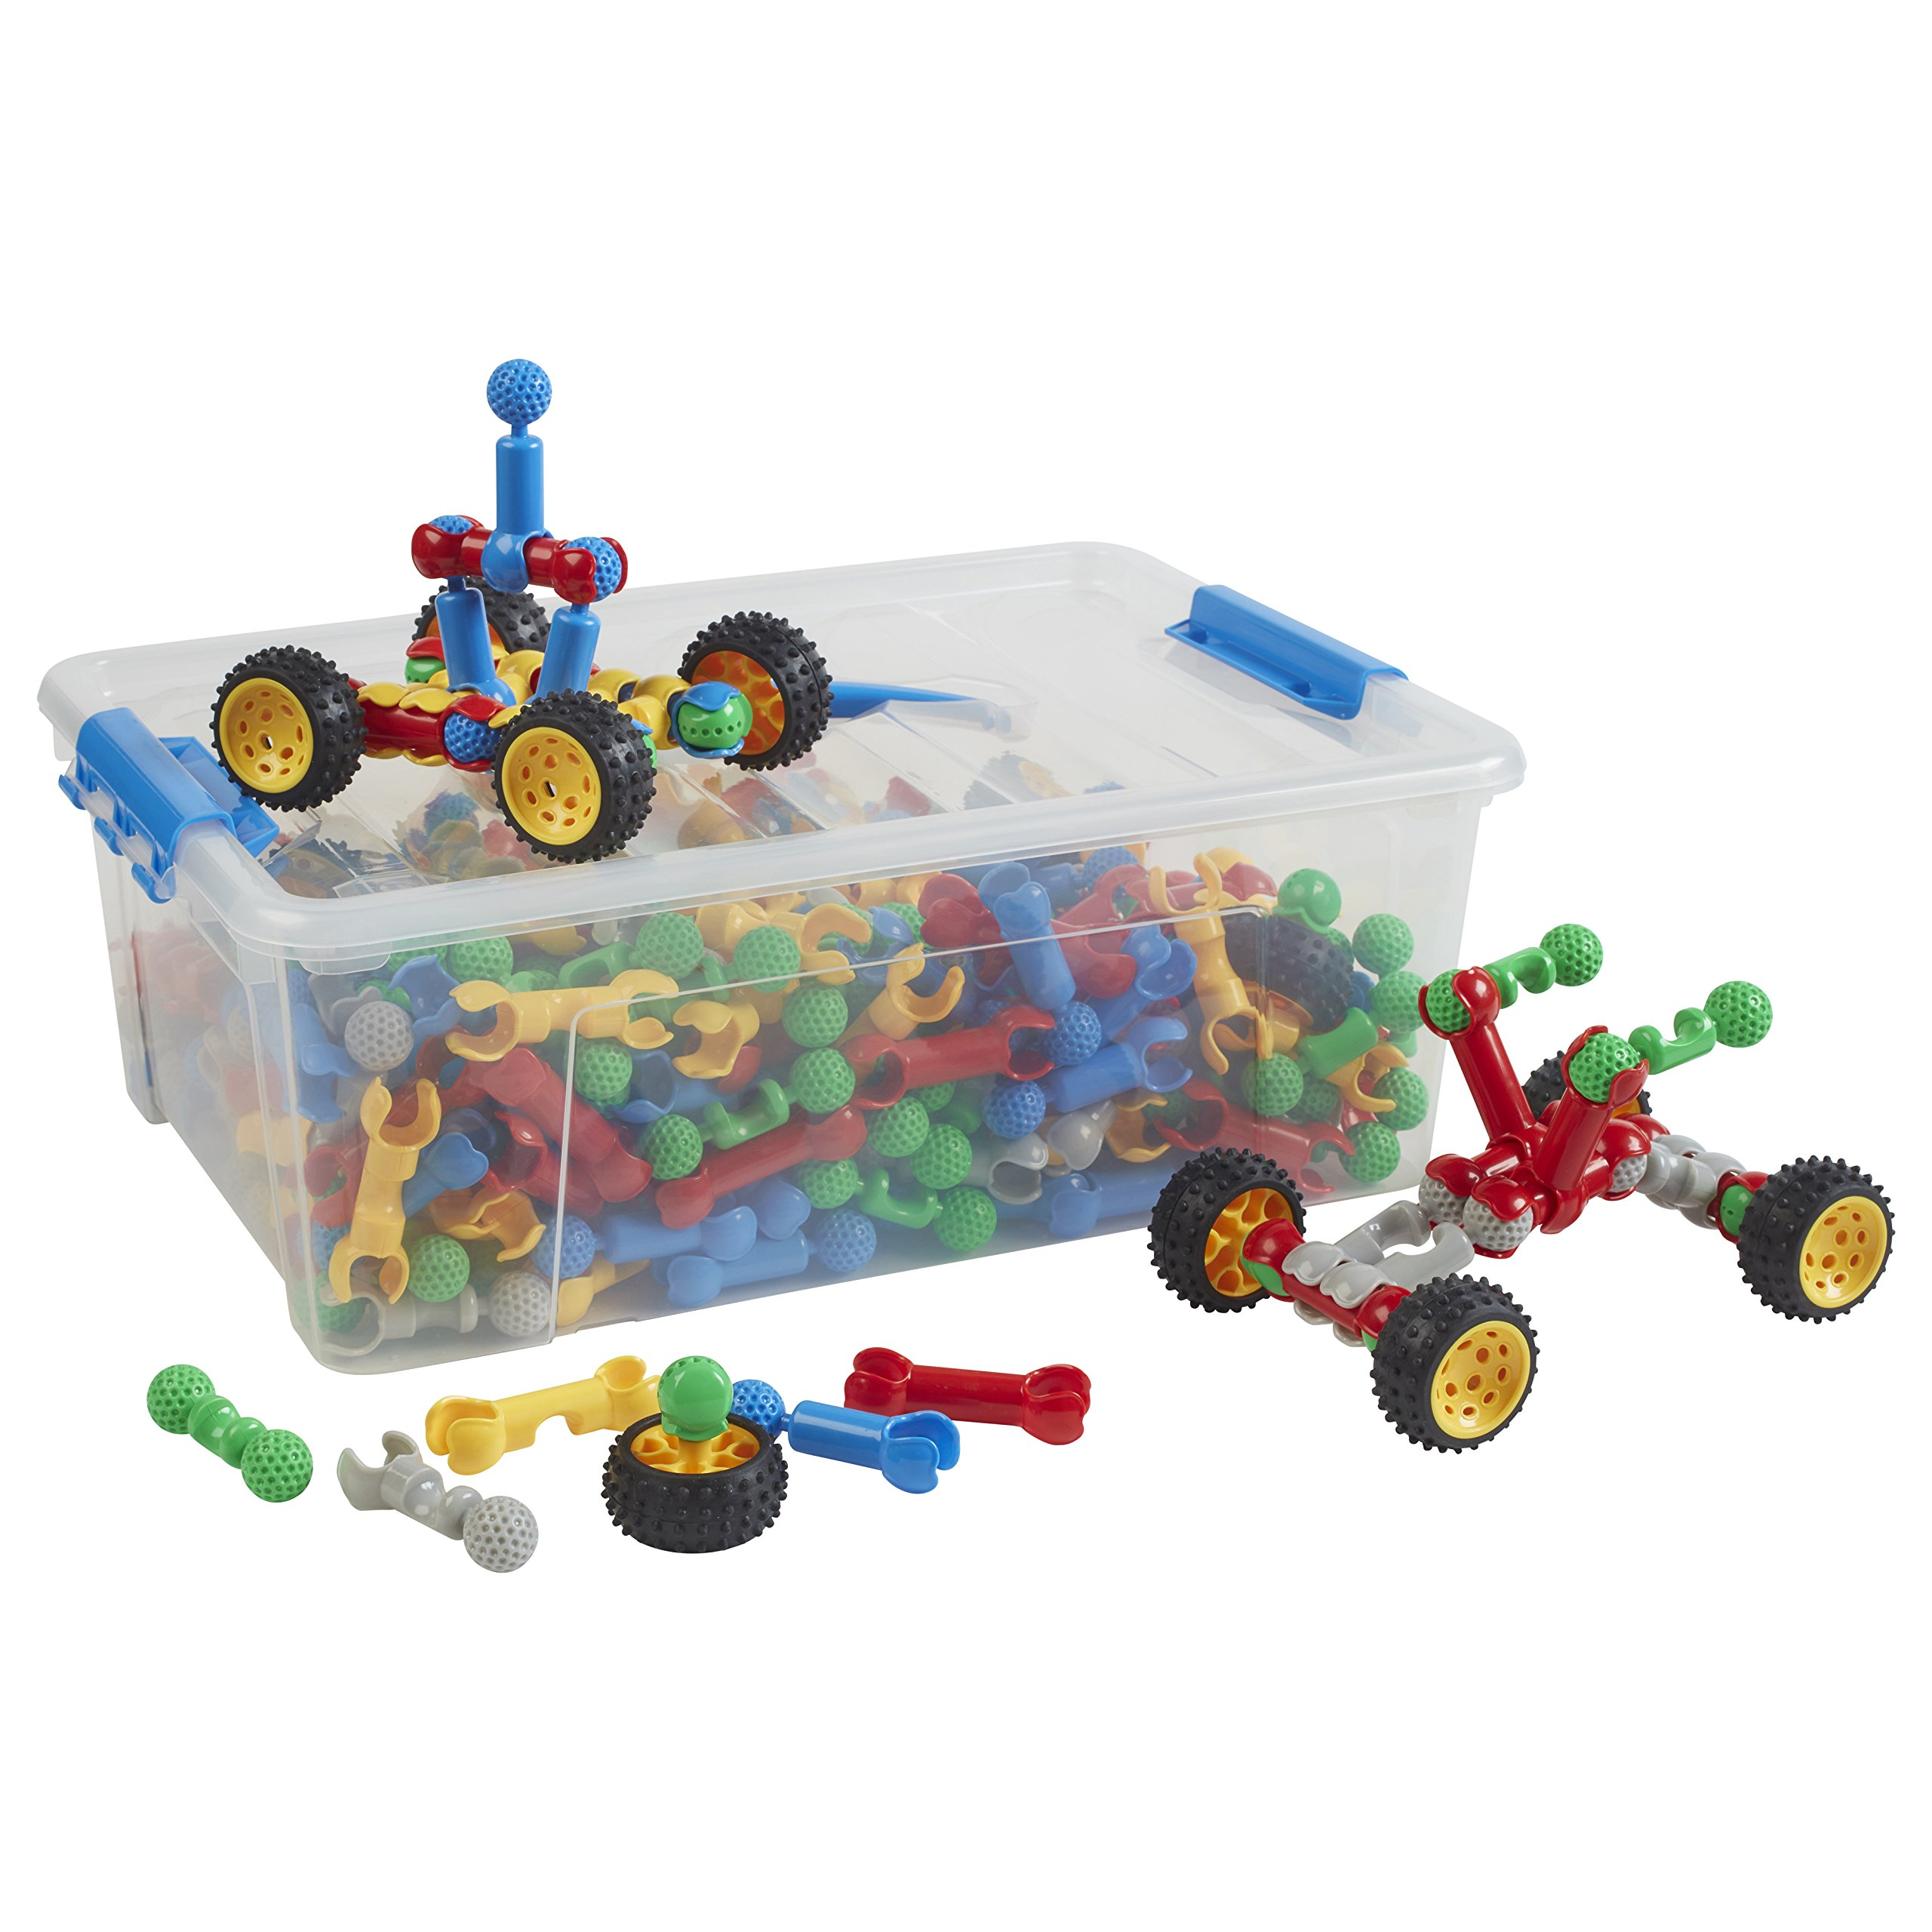 ECR4Kids Socket-to-Me Set Math Manipulatives Building Kit, Educational Sensory Learning Toys for Children (320-Piece Set) by ECR4Kids